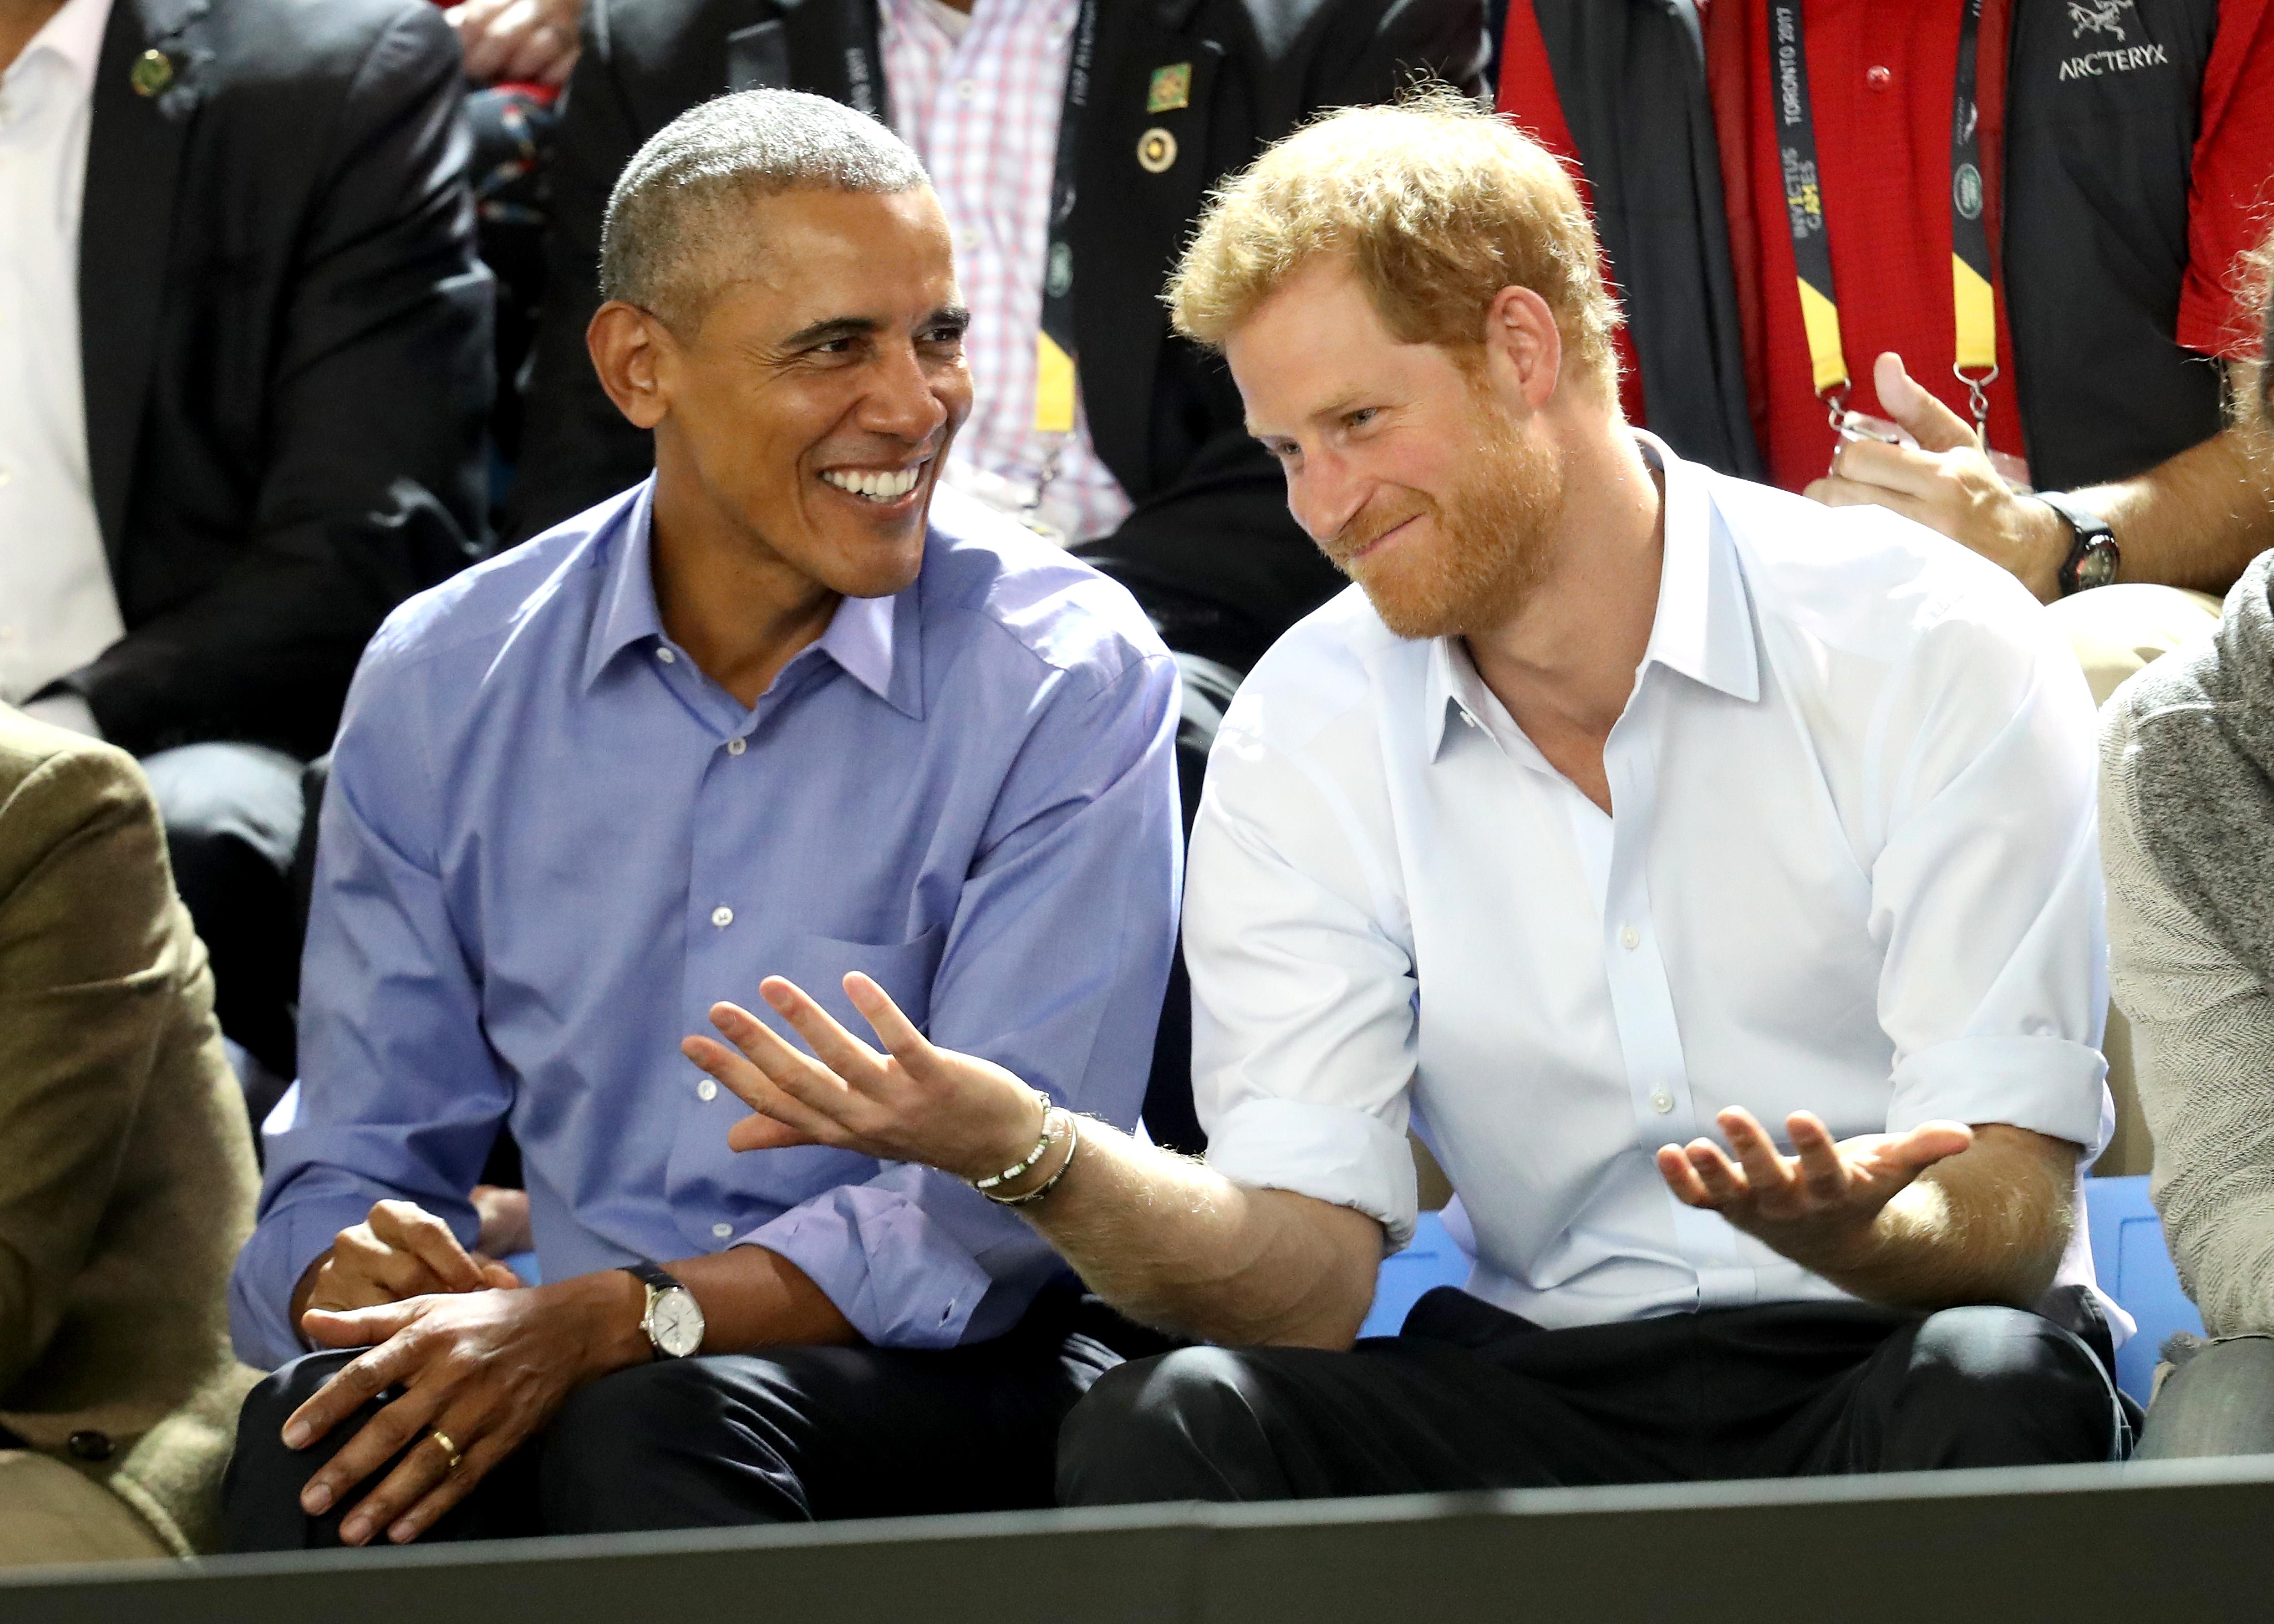 prince harry obama invictus games